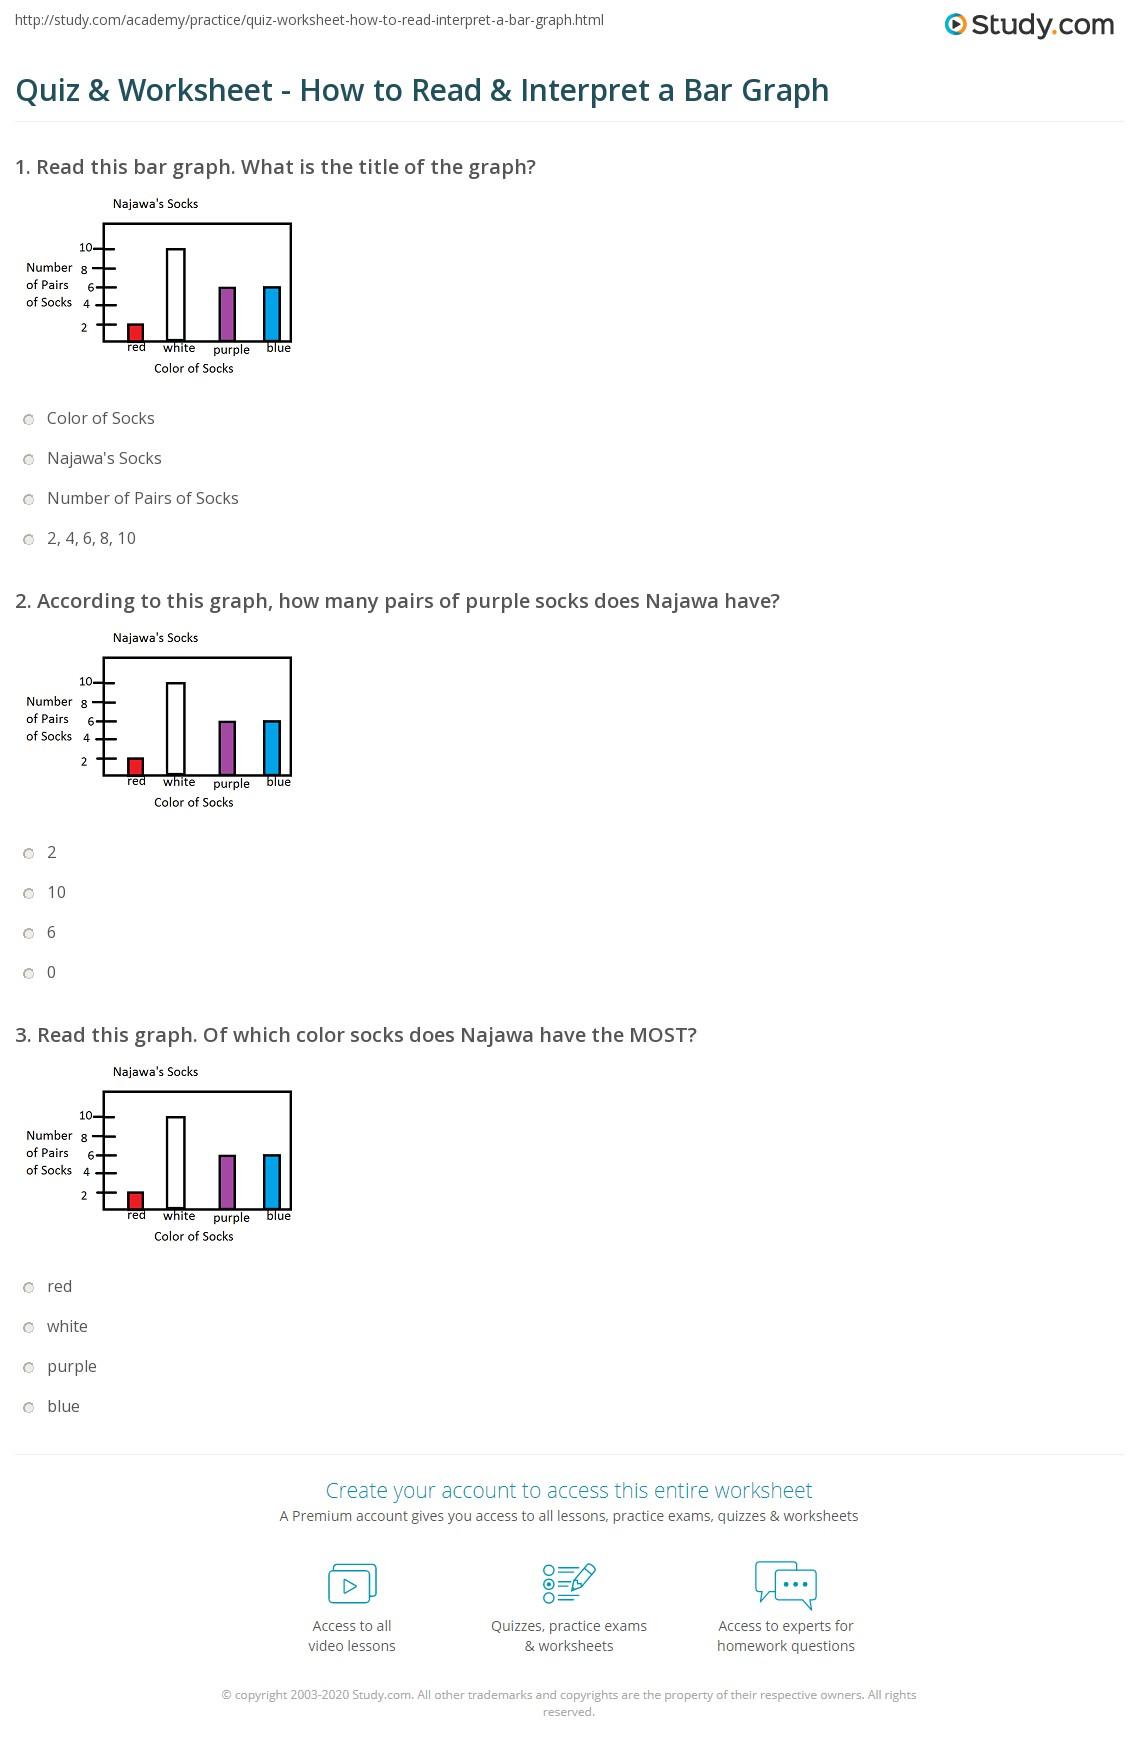 hight resolution of Quiz \u0026 Worksheet - How to Read \u0026 Interpret a Bar Graph   Study.com